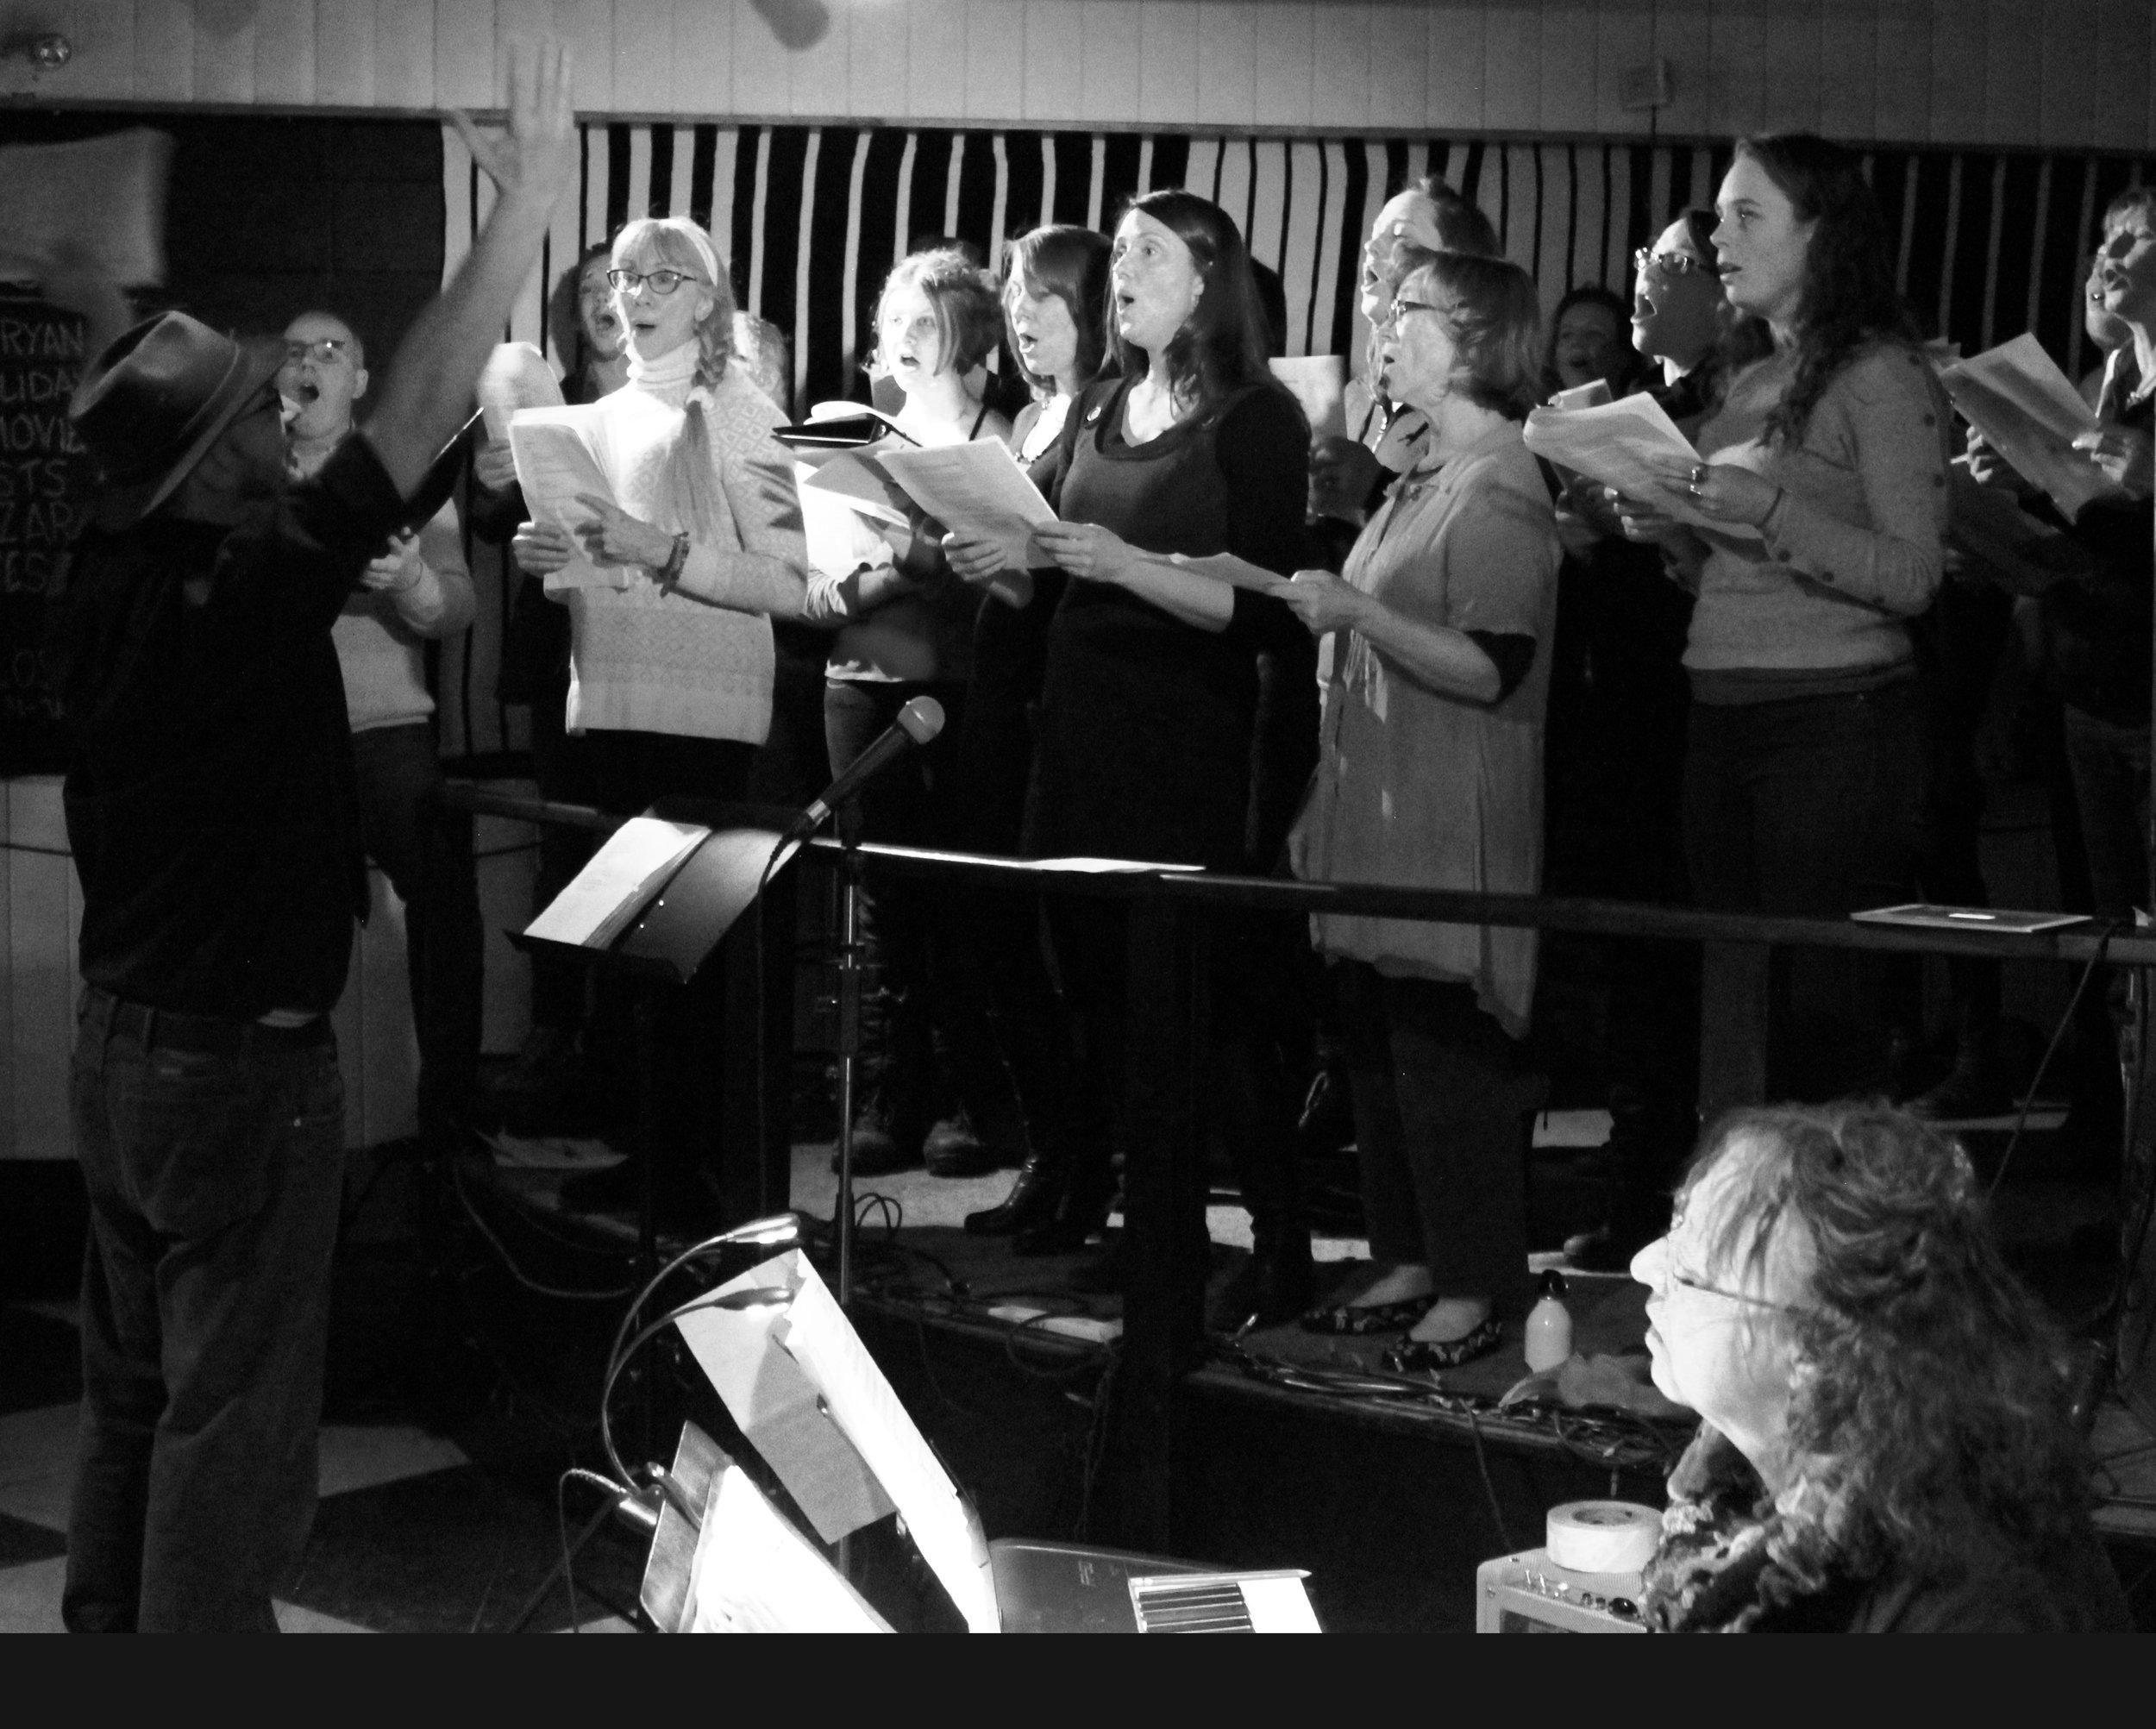 Choir-Full_bw_6809.jpg